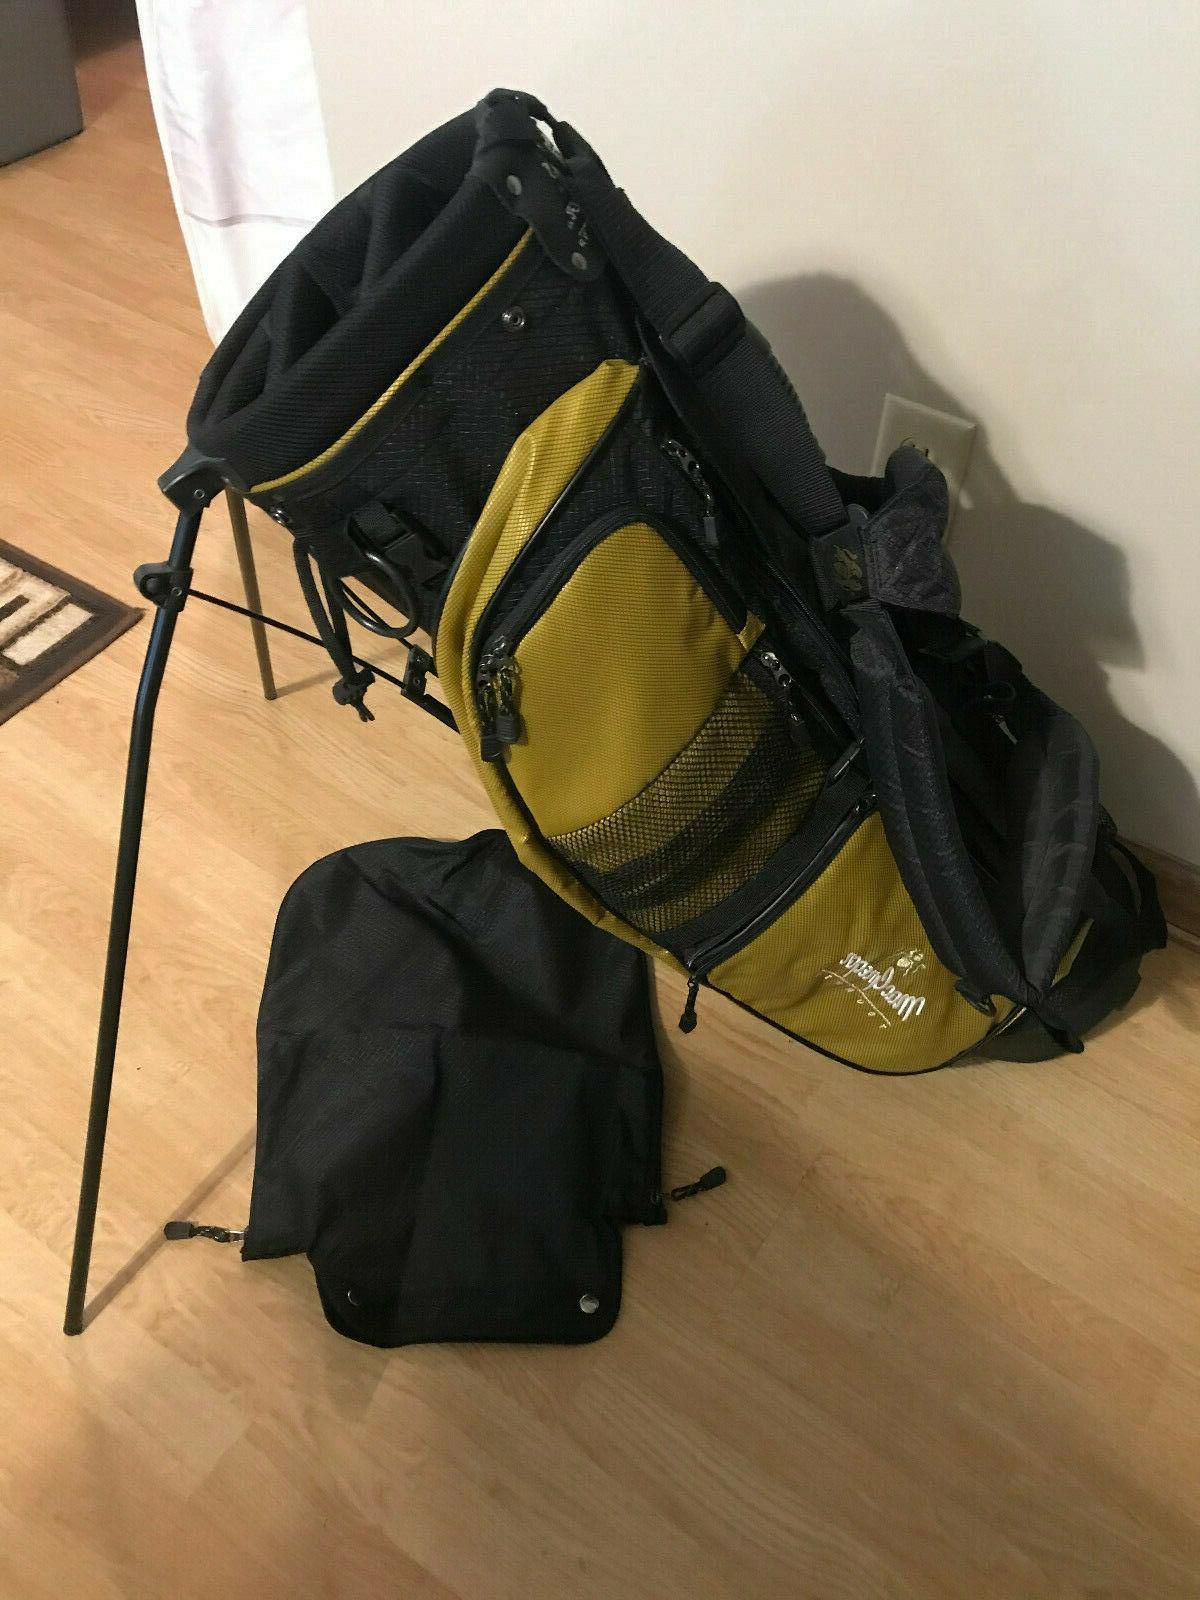 tourney lightweight stand golf bag dual strap